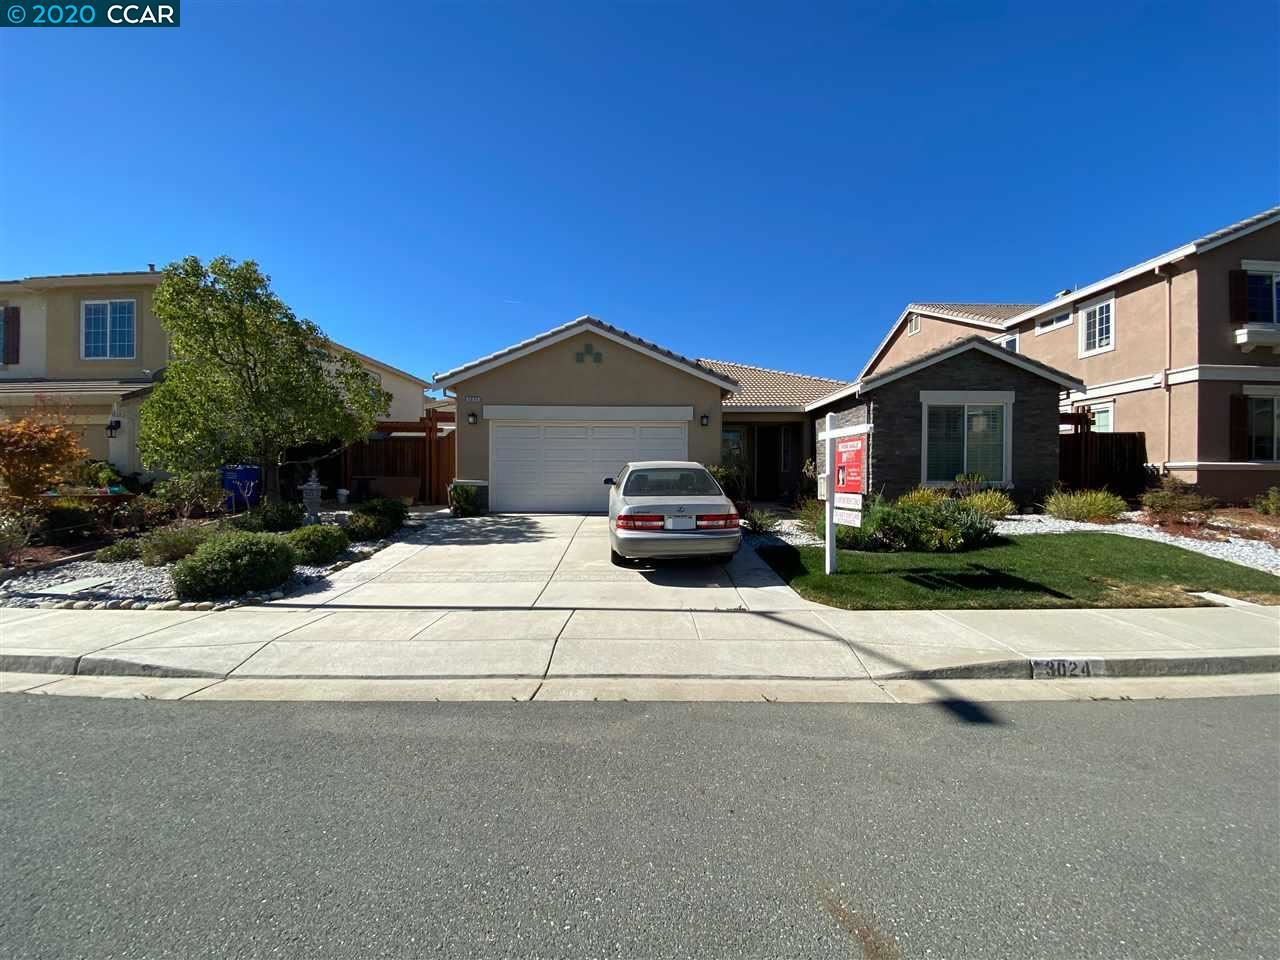 Photo for 3024 Rancho Bernado Drive, BAY POINT, CA 94565 (MLS # 40925880)